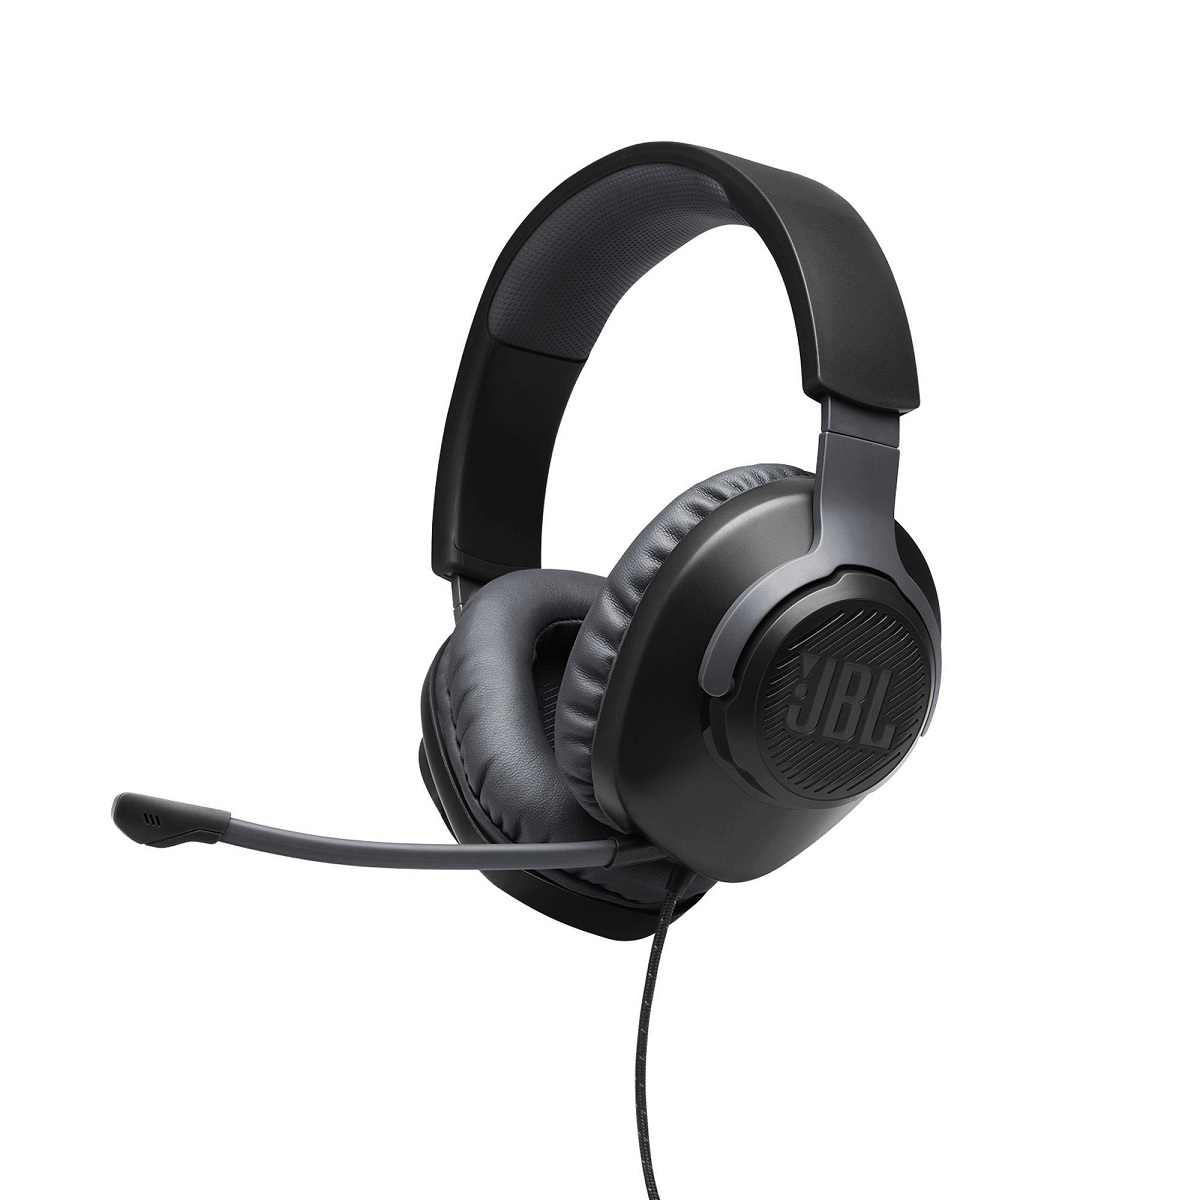 Headset Gamer Quantum 100 Preto JBL Conector P2 Microfone Removivel